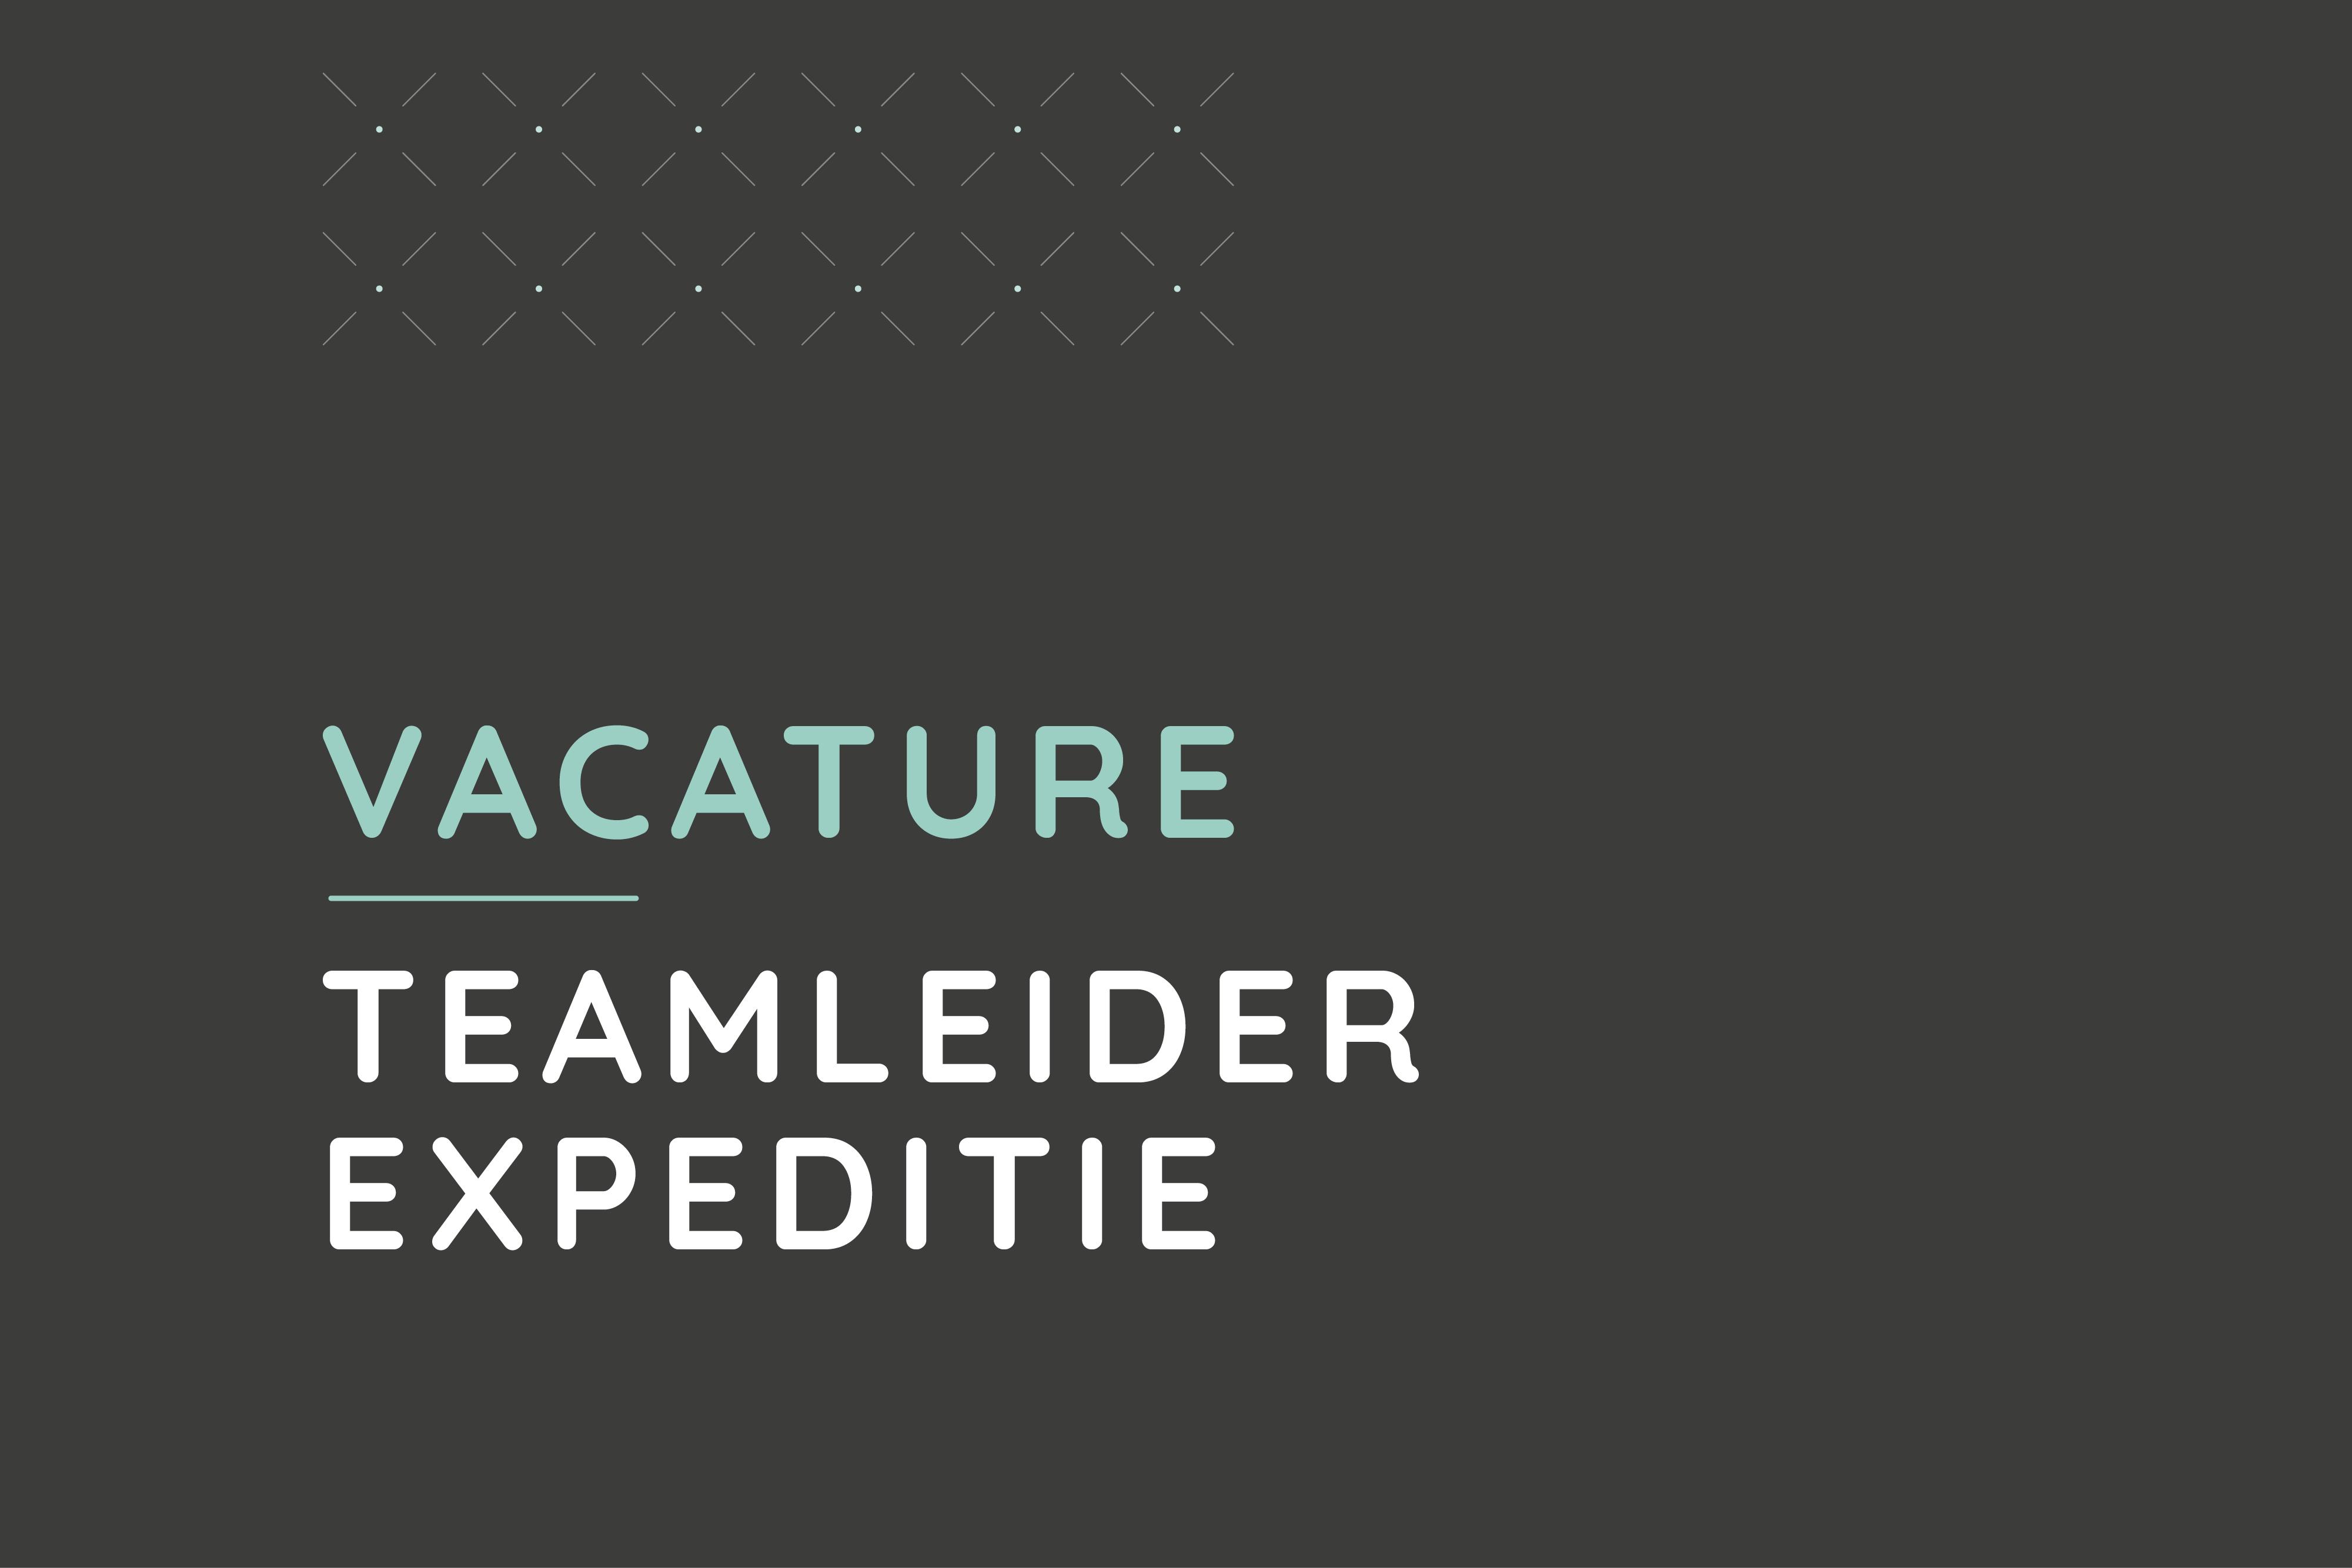 Teamleider Expeditie